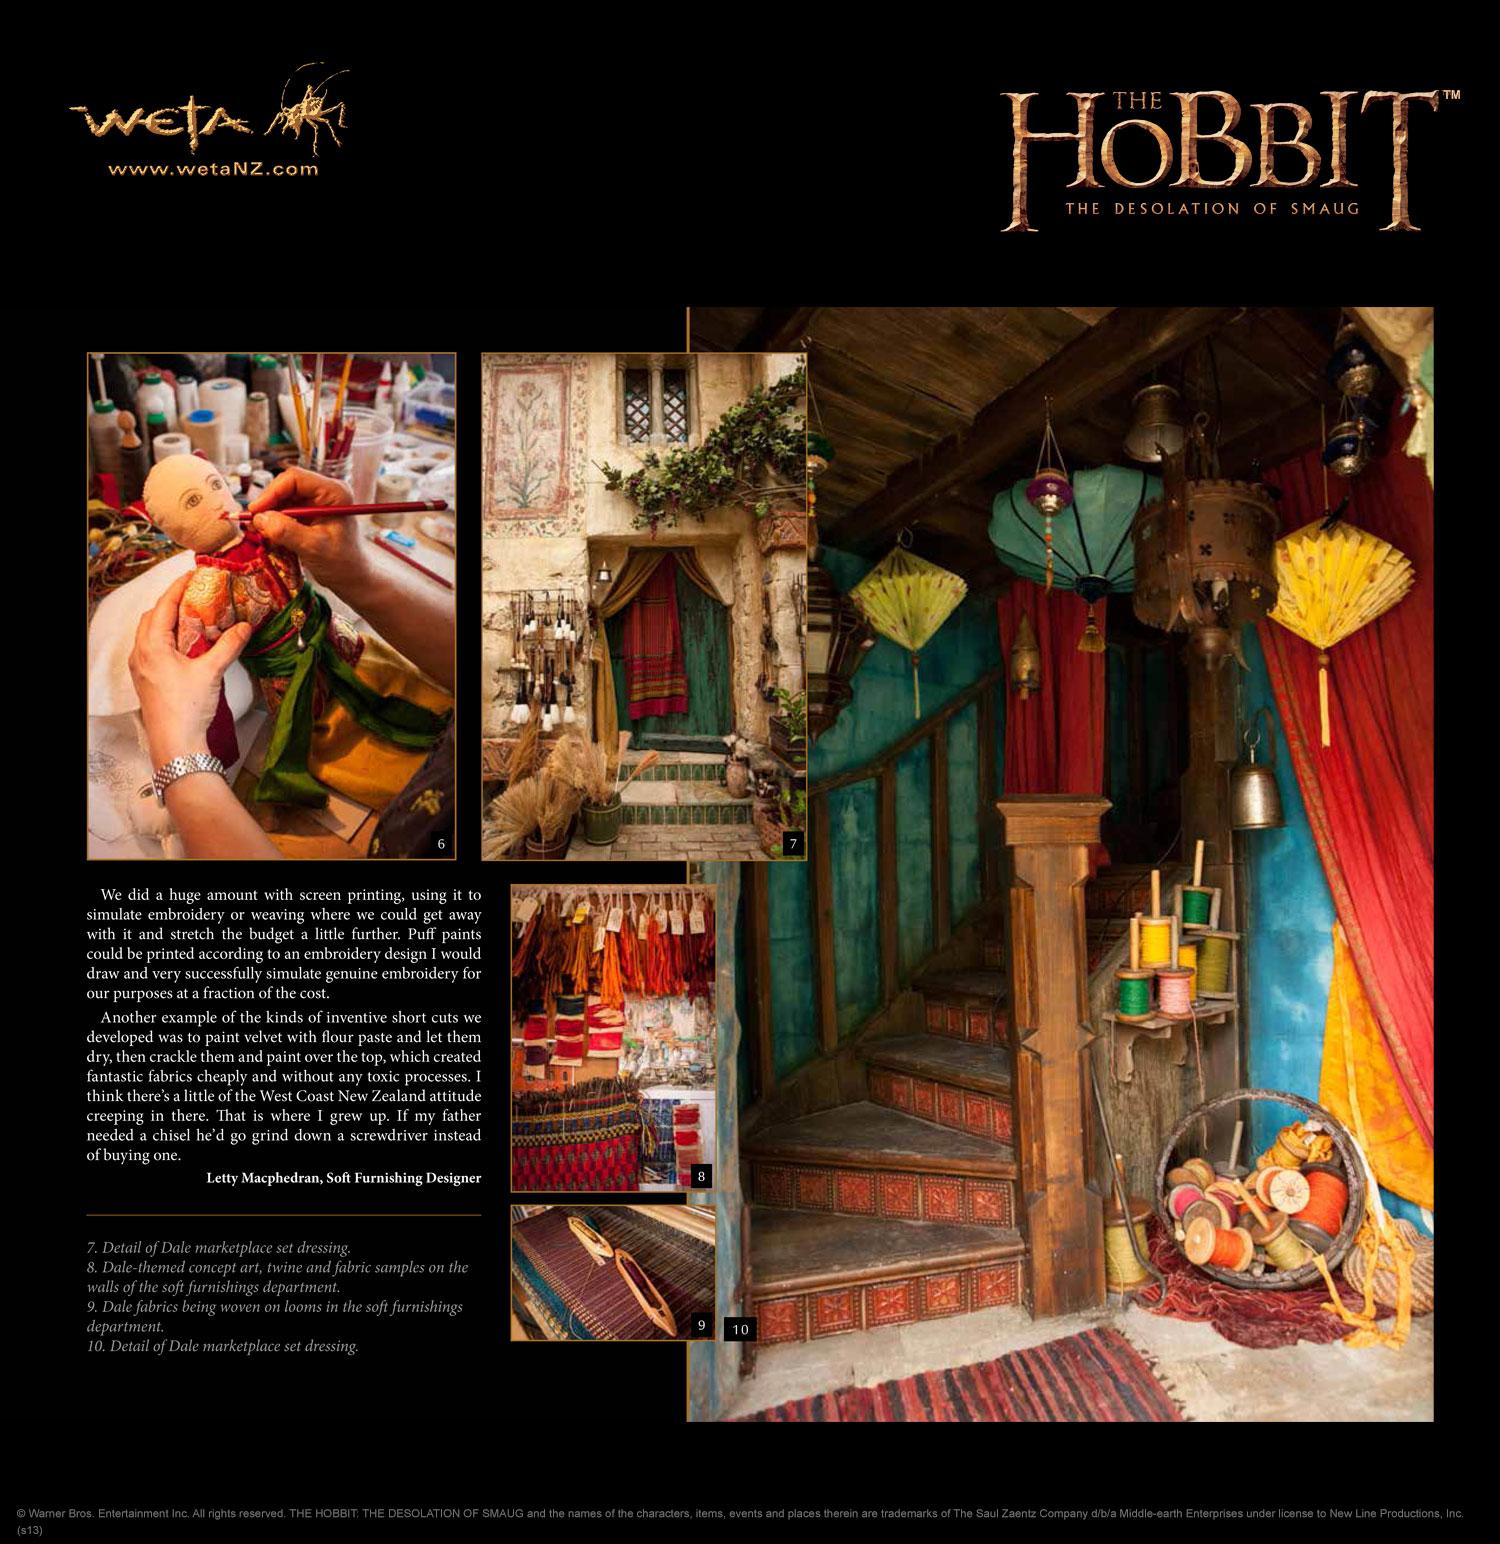 hobbit-chroniclesDoSCloaksDaggersc2